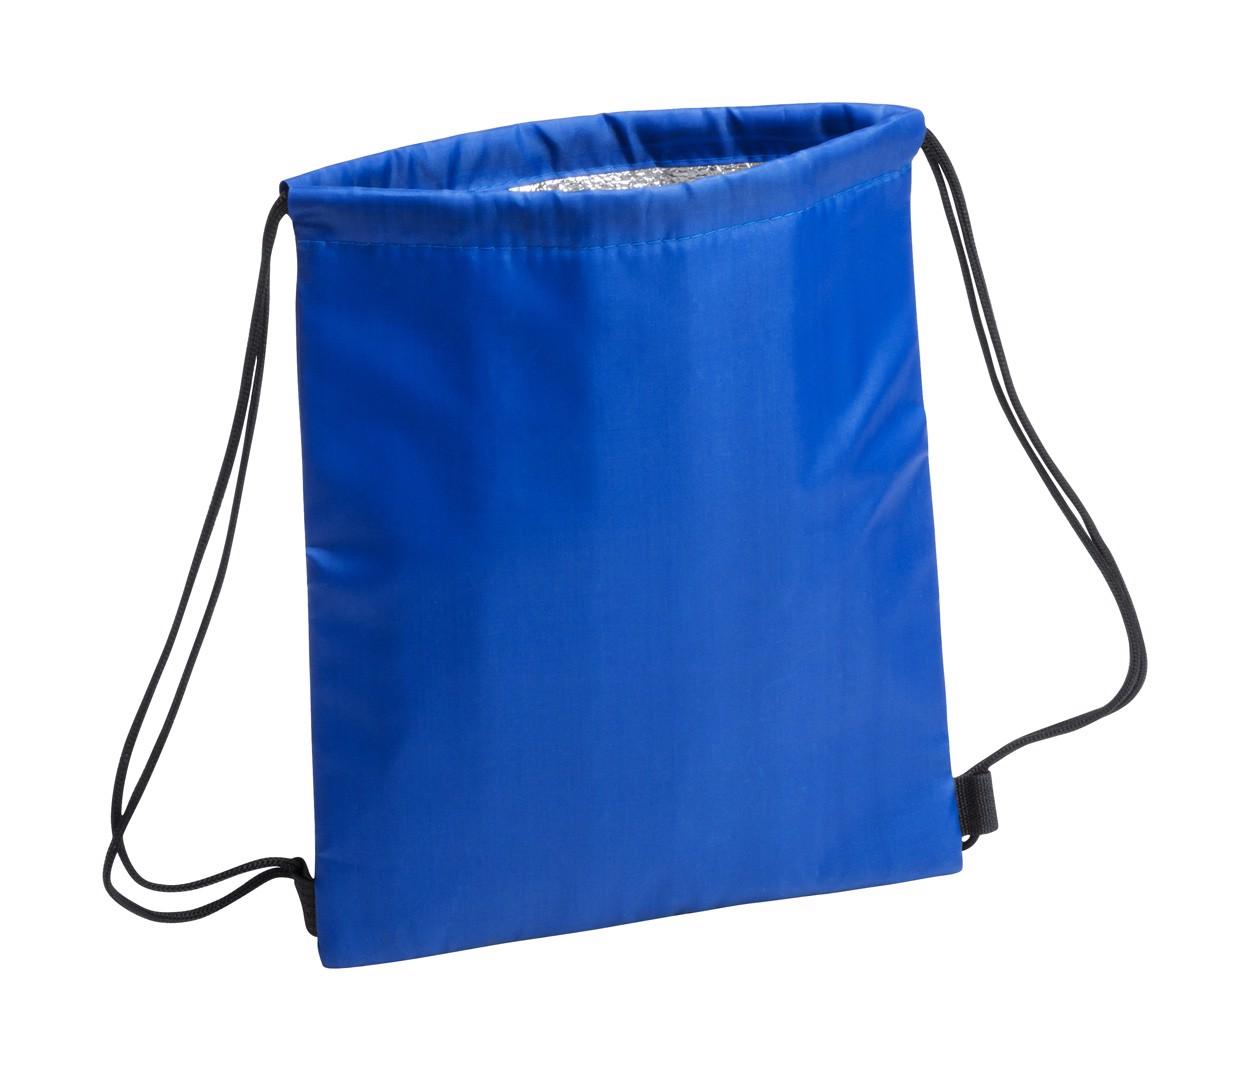 Geantă Drawstring Termoizolantă Tradan - Albastru